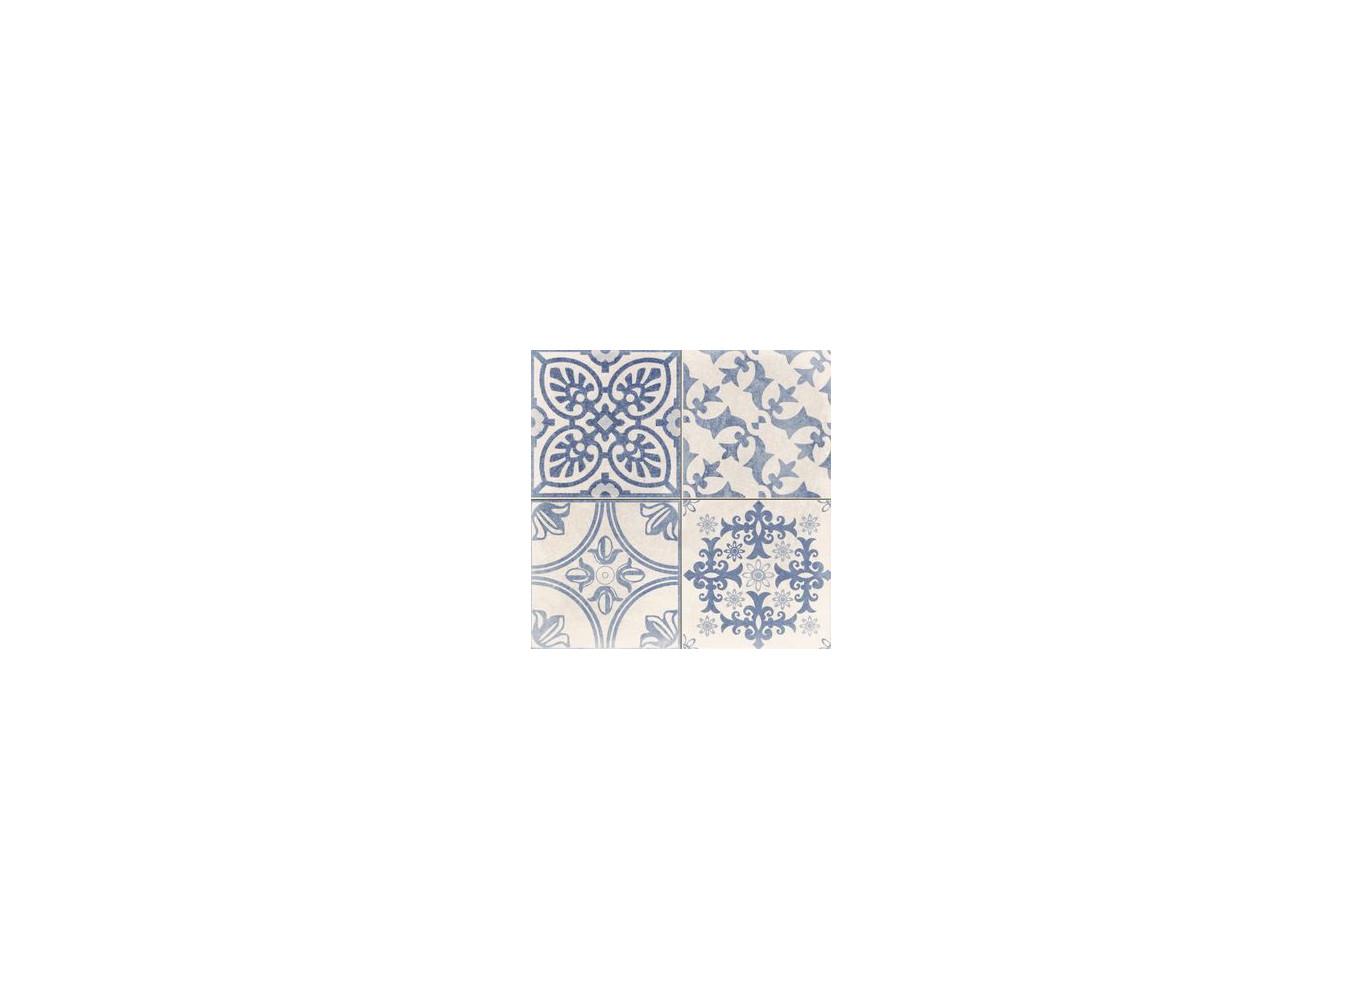 Gresie / Faianta Portelanata Skyros Deco Blanco 44x44 cm 1 - Liv Art